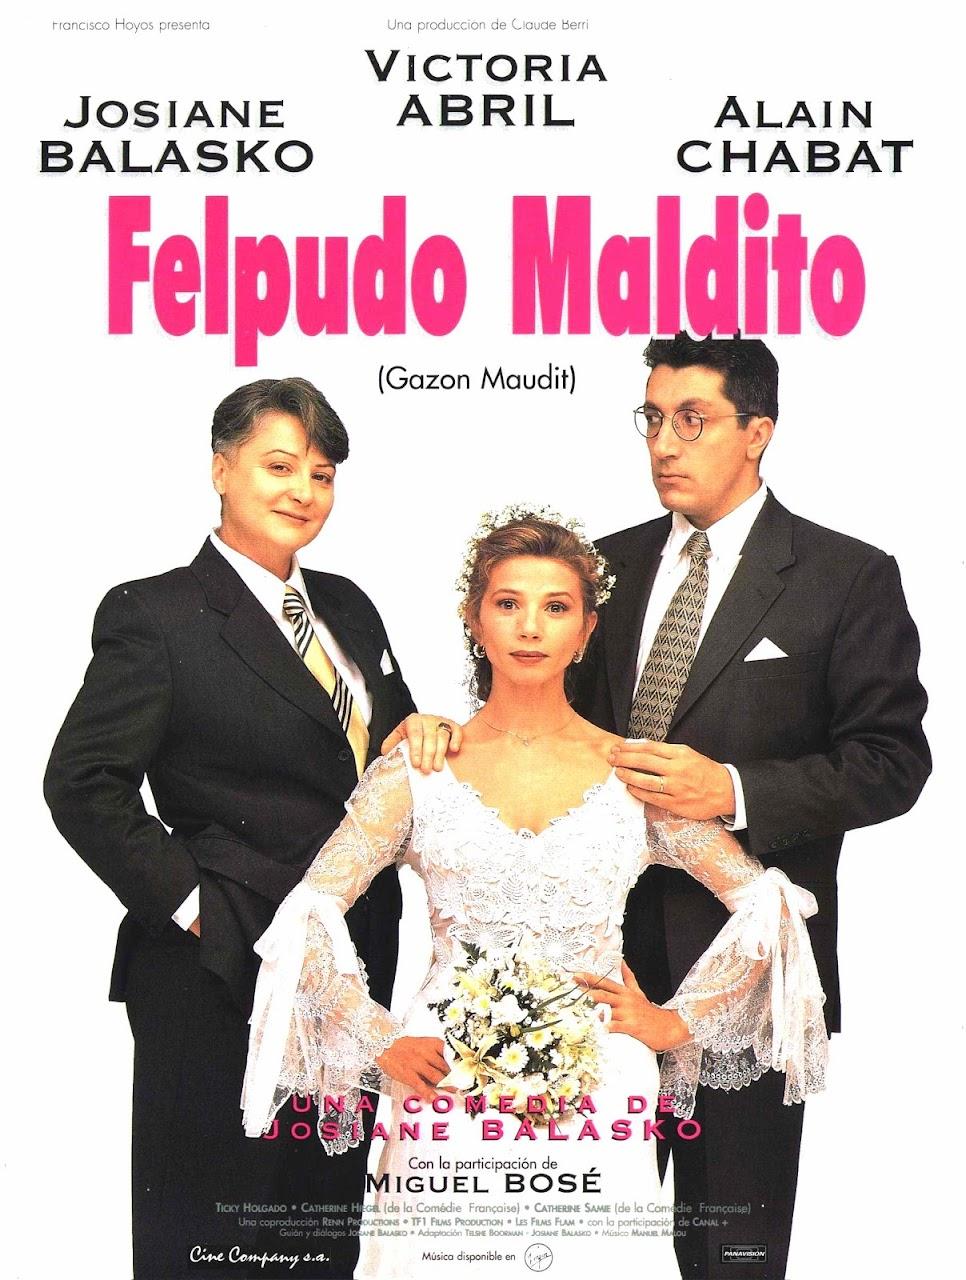 http://4.bp.blogspot.com/-vf6oM3uPGcU/T6695enVECI/AAAAAAAANgo/KZpwsfBvC5I/s640/1995+-+Felpudo+maldito+-+Gazon+Maudit+-+tt0113149.jpg